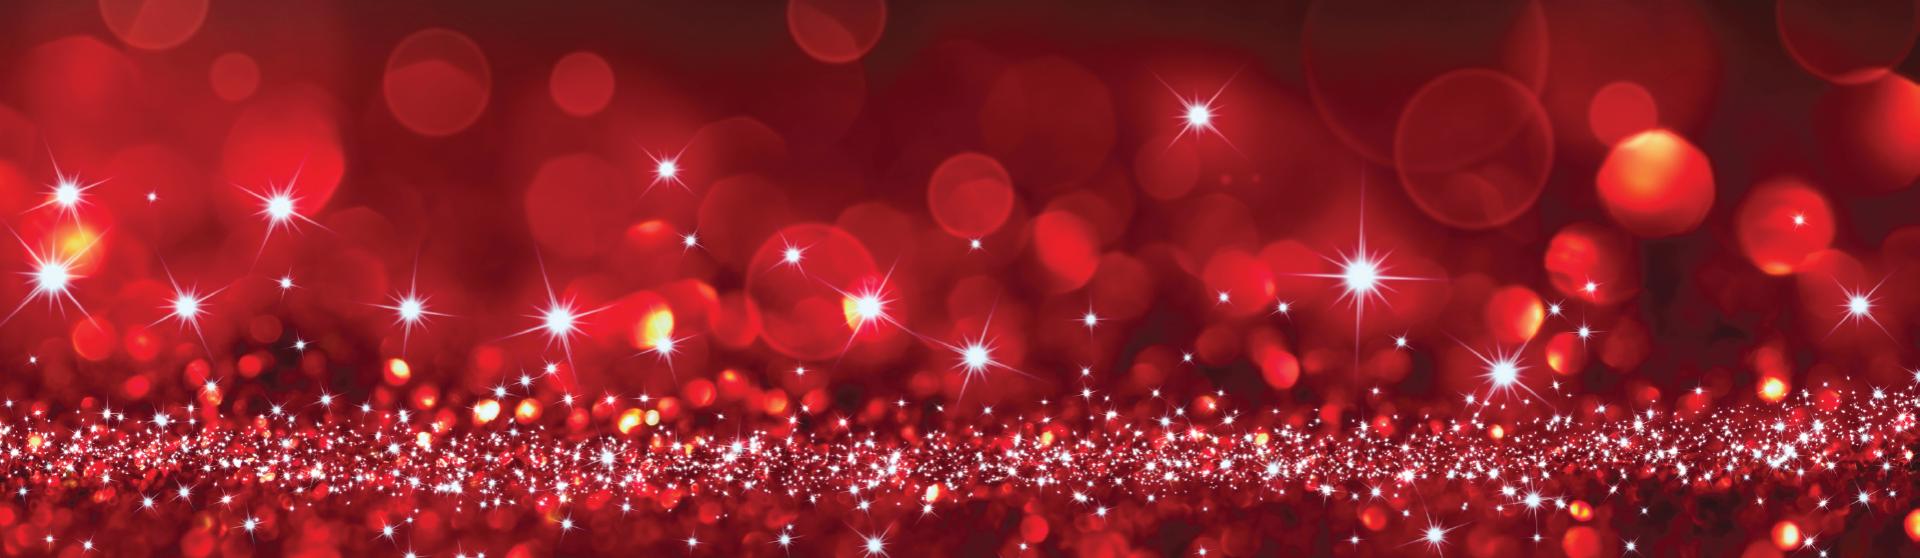 Does Santa need a new sleigh?